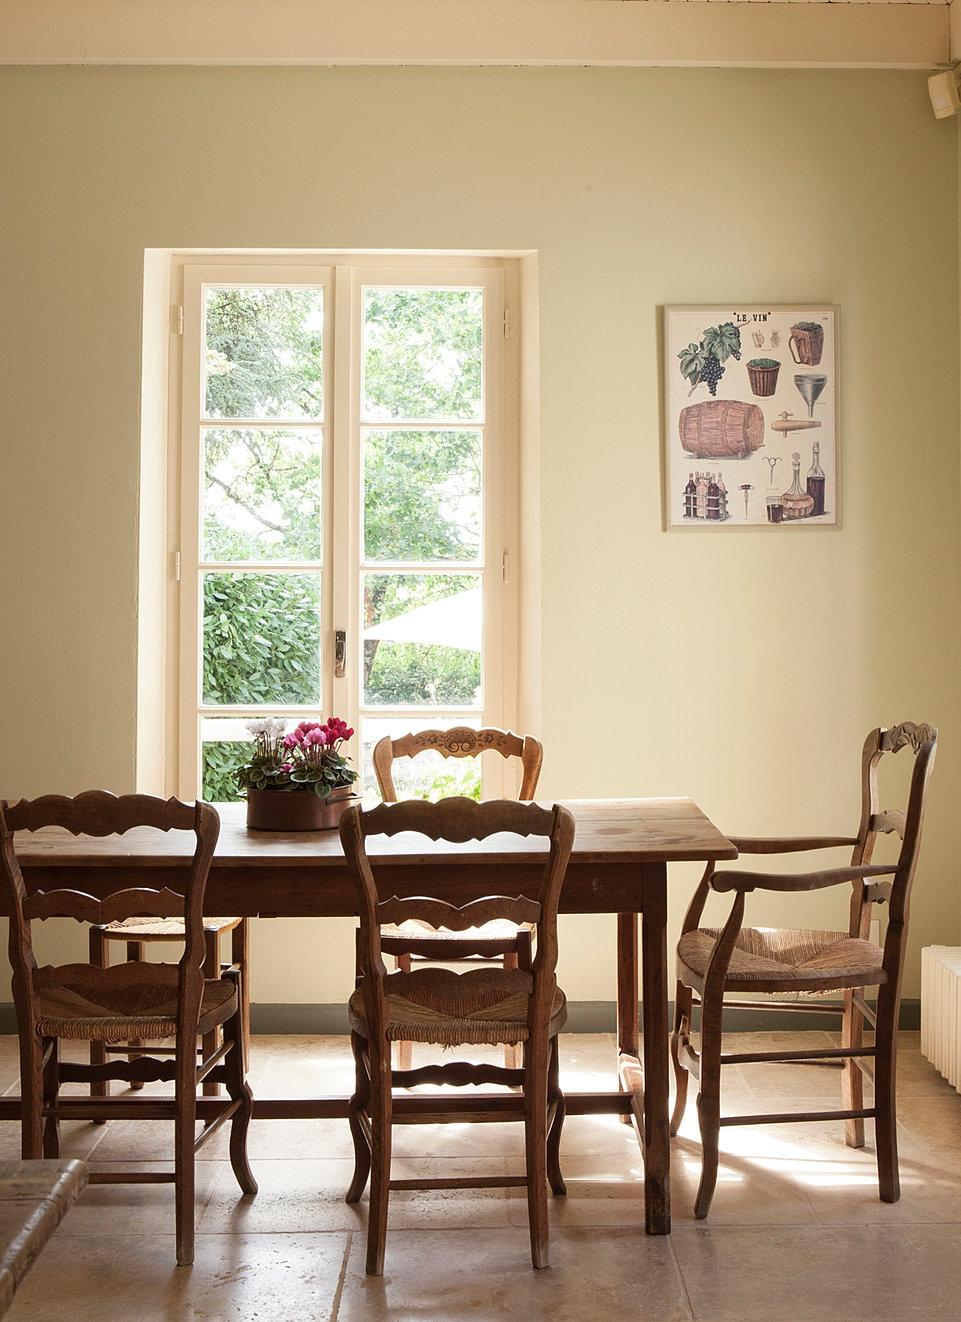 Kitchen Eating Area La Grange Du Barry Explore The Property Further